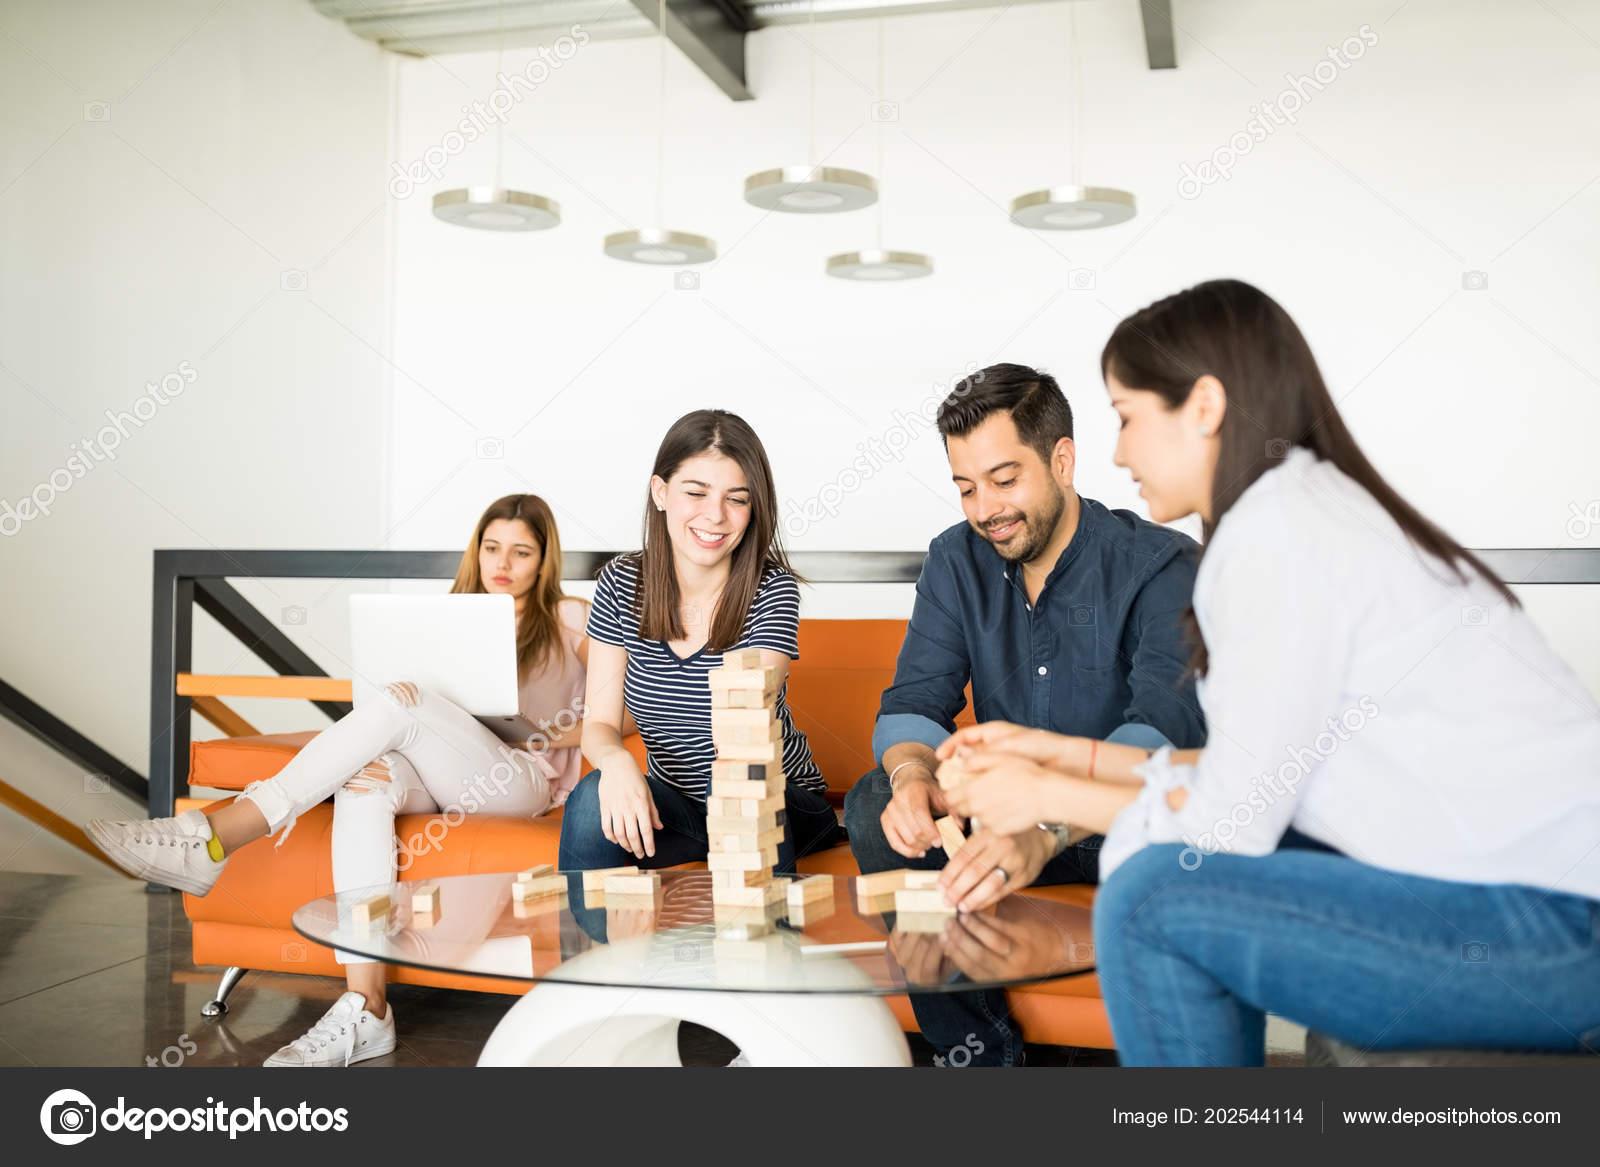 Groupe jeunes gens jouant jenga tout Étant assis bureau salon